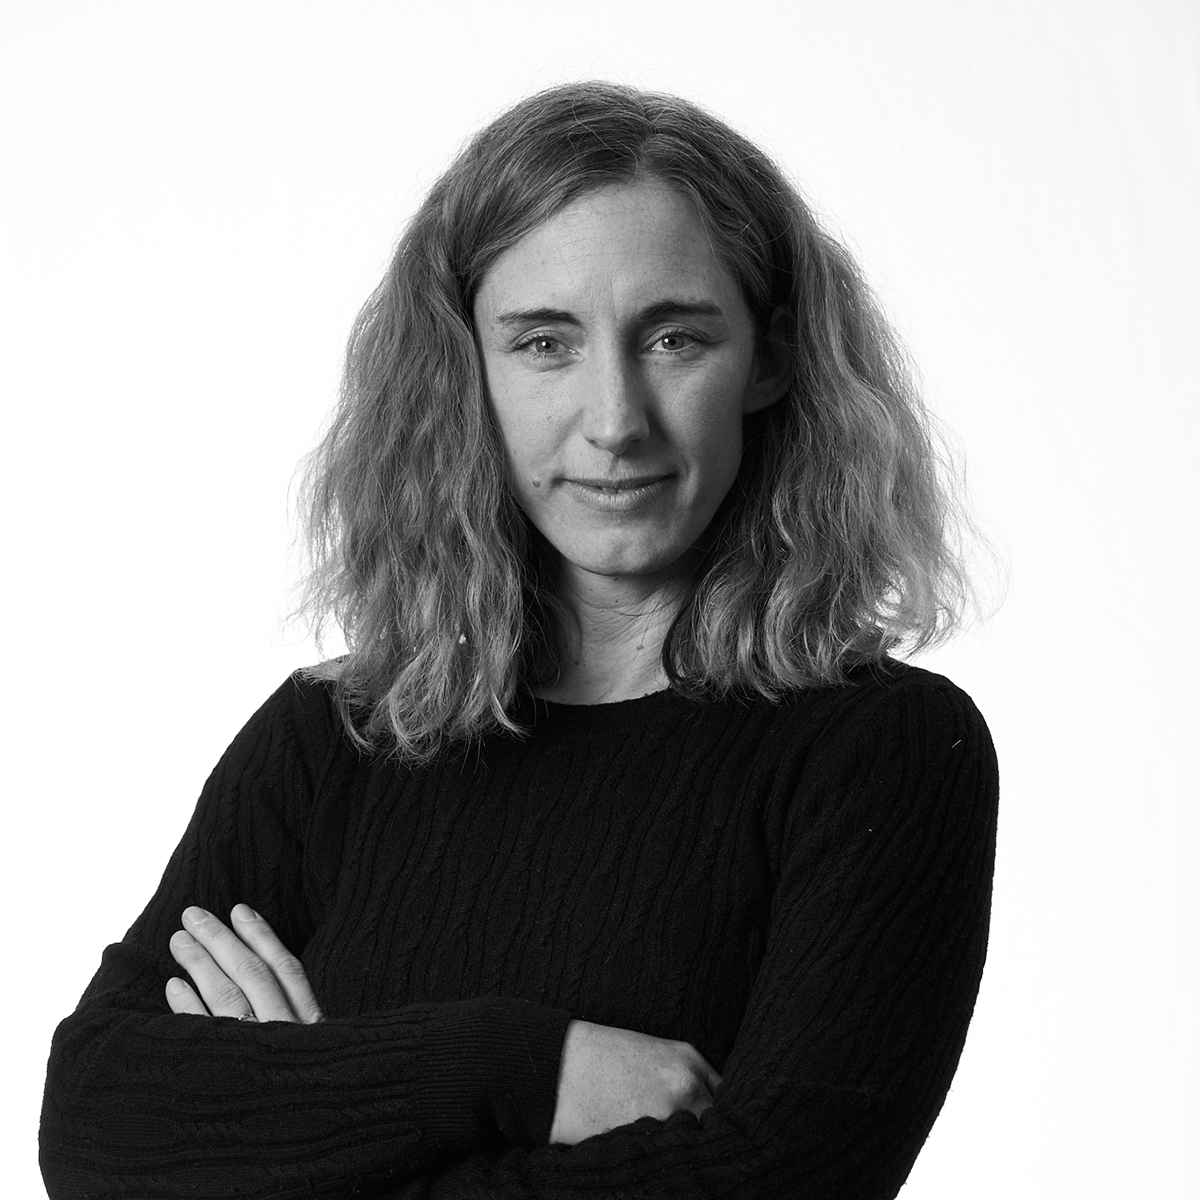 Christiane Candella porträtt svartvit